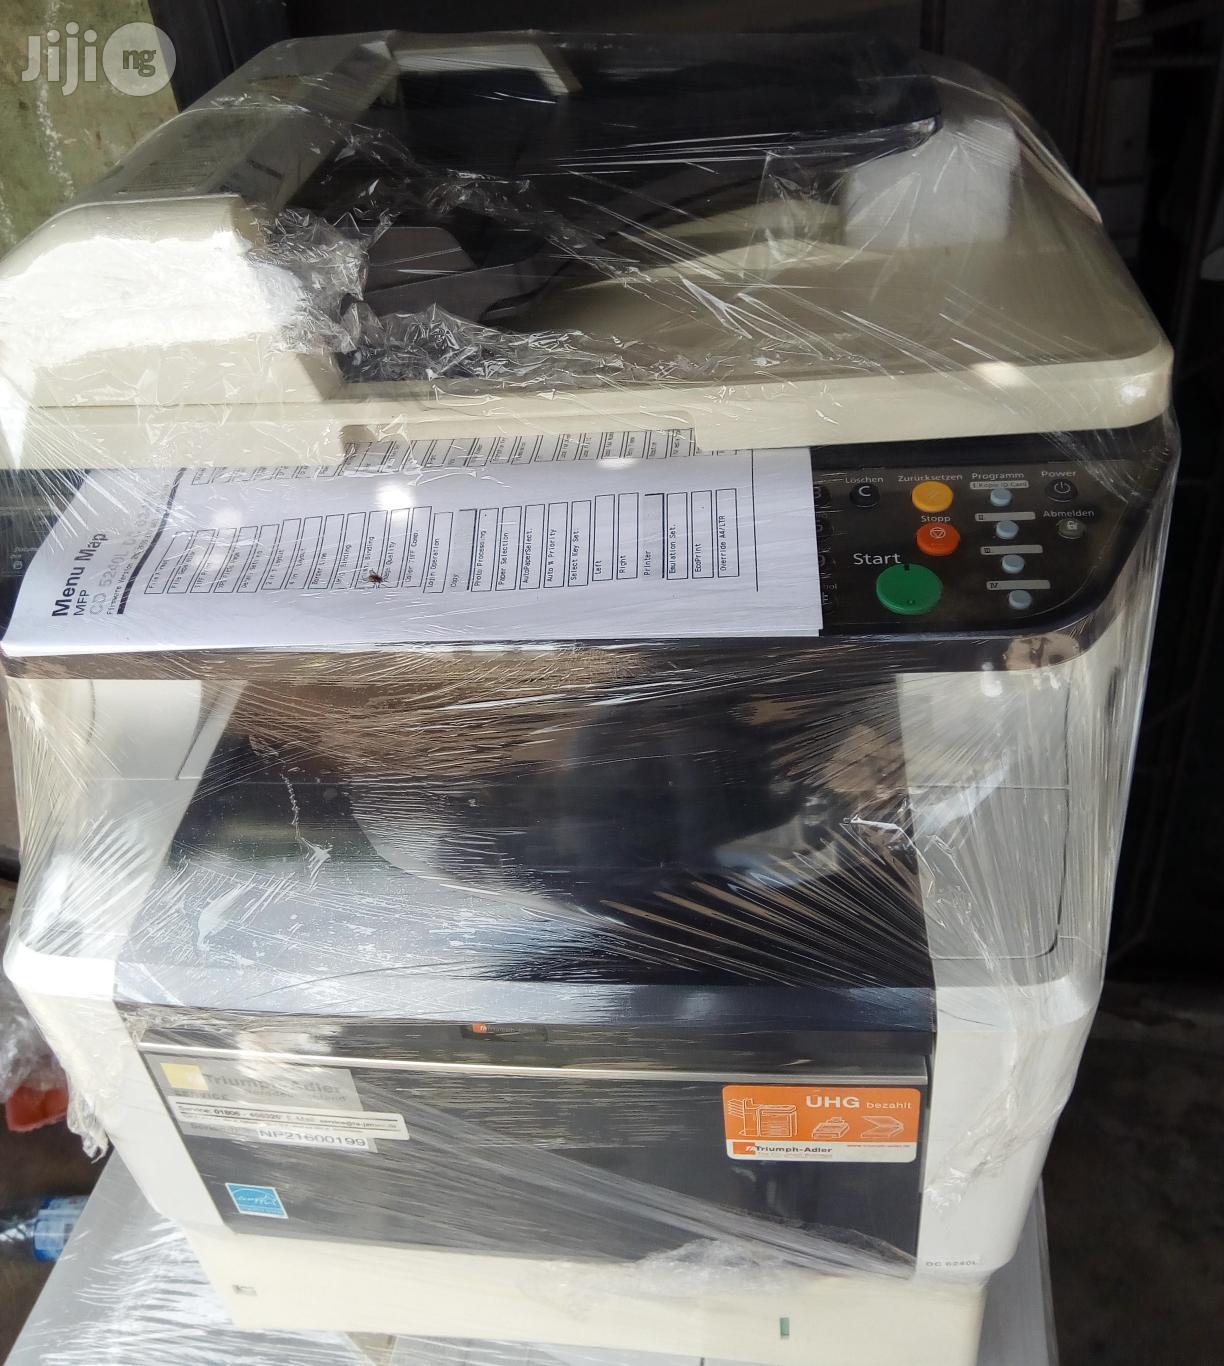 Kyocera/Triumph Adler Dc 6240 Multifunctional Photocopy